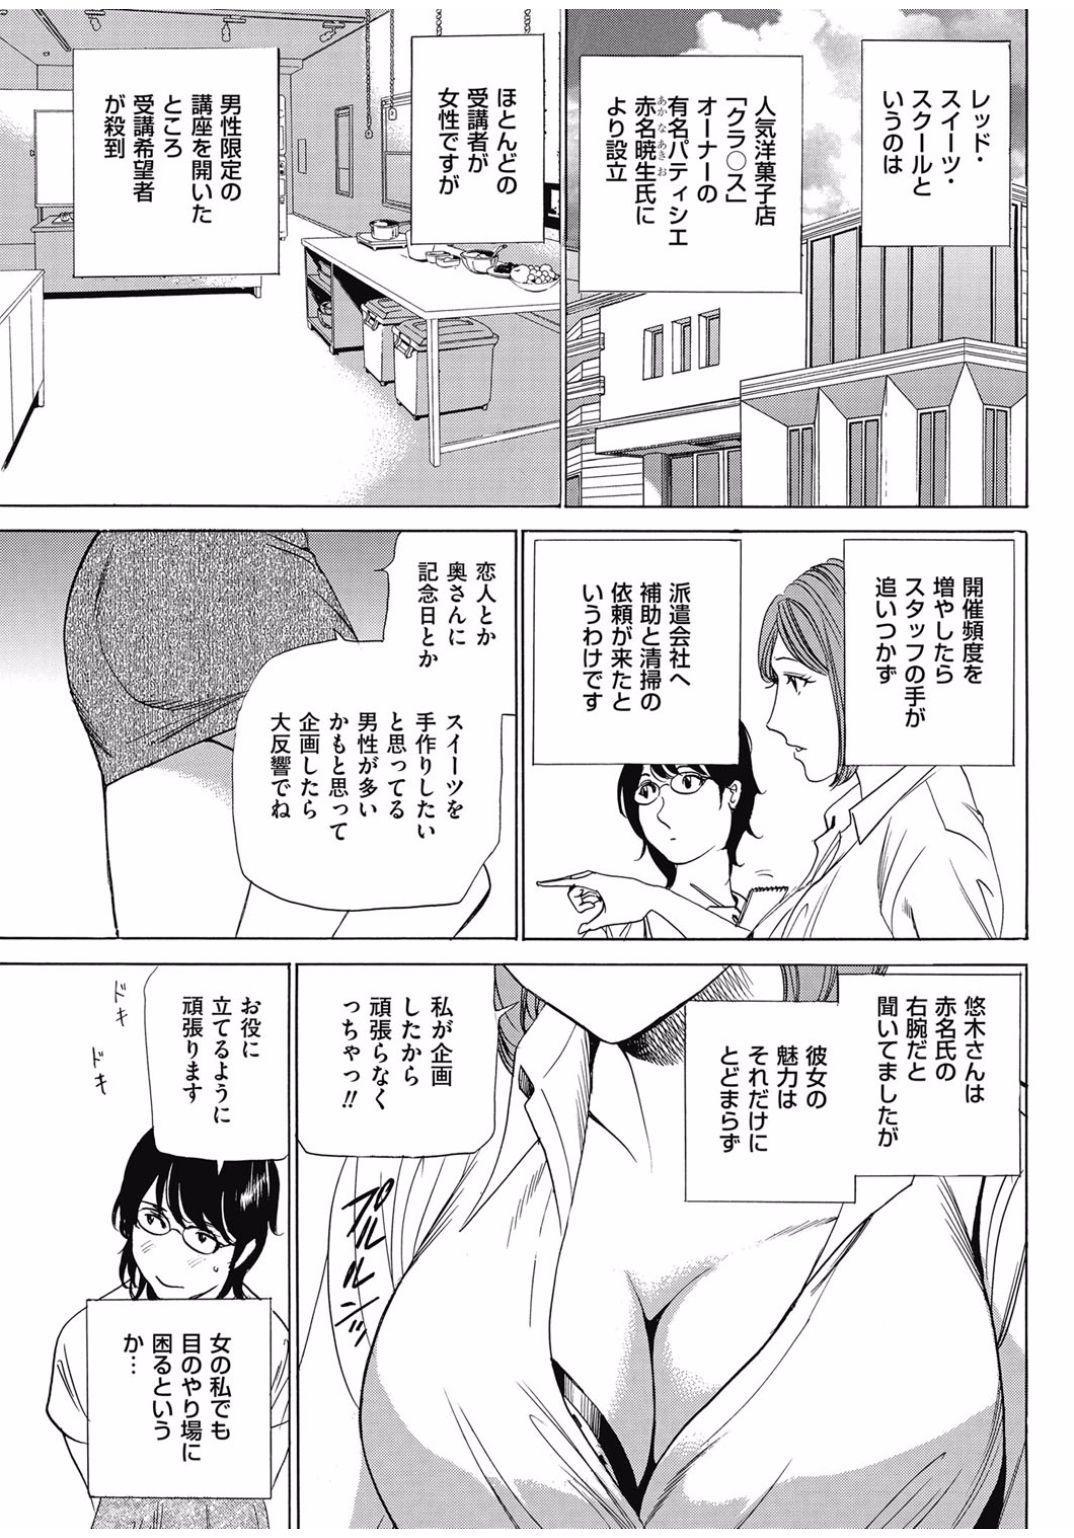 Wa Usuki Ipa a 1-10 75